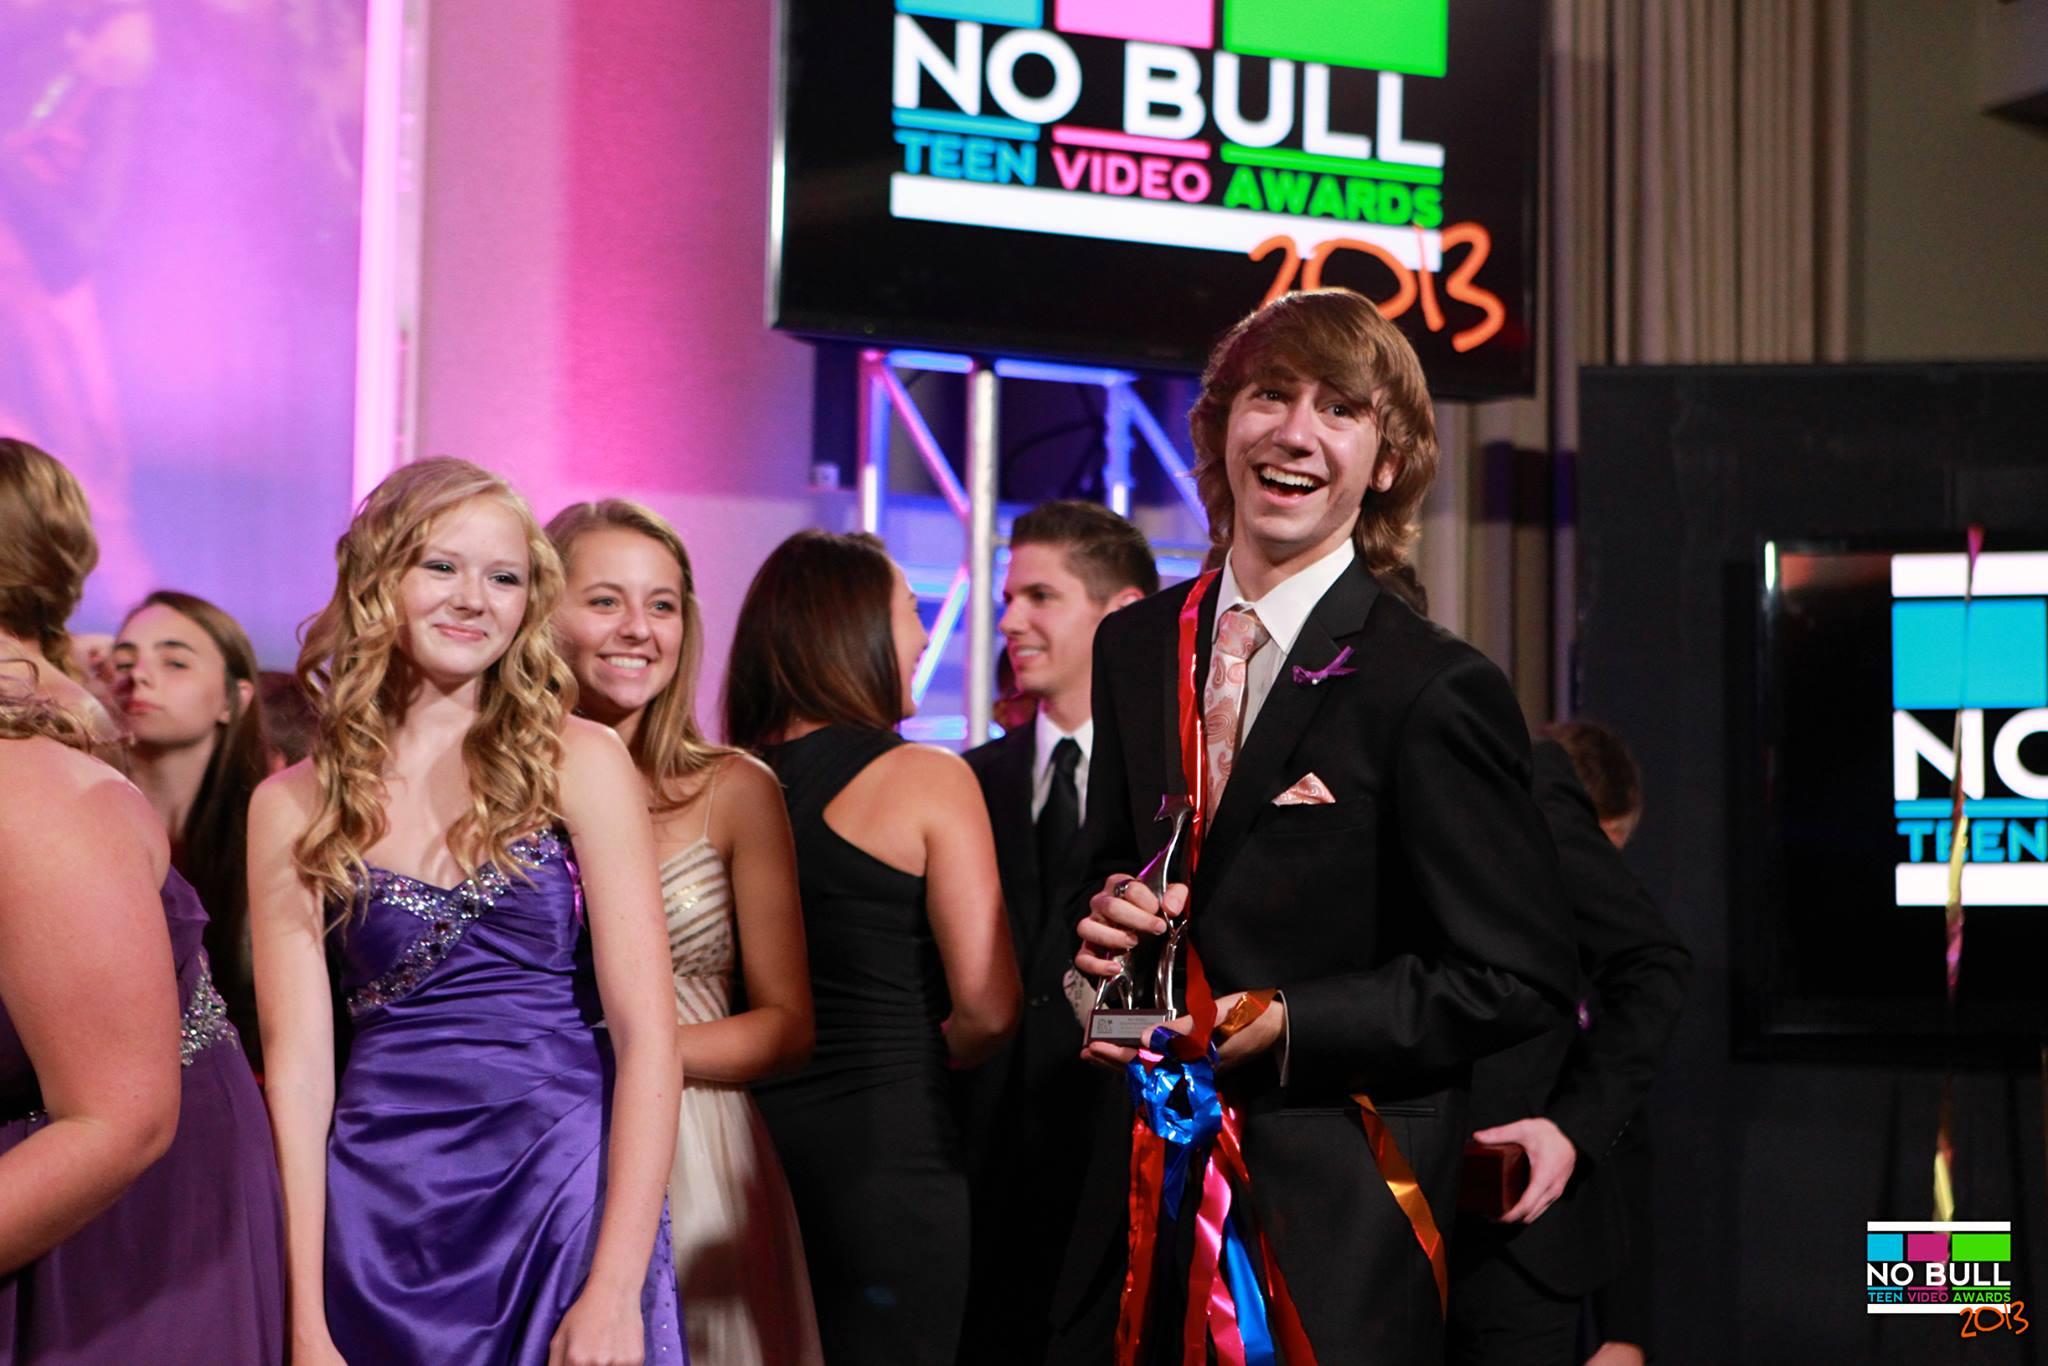 Teen Video Awards